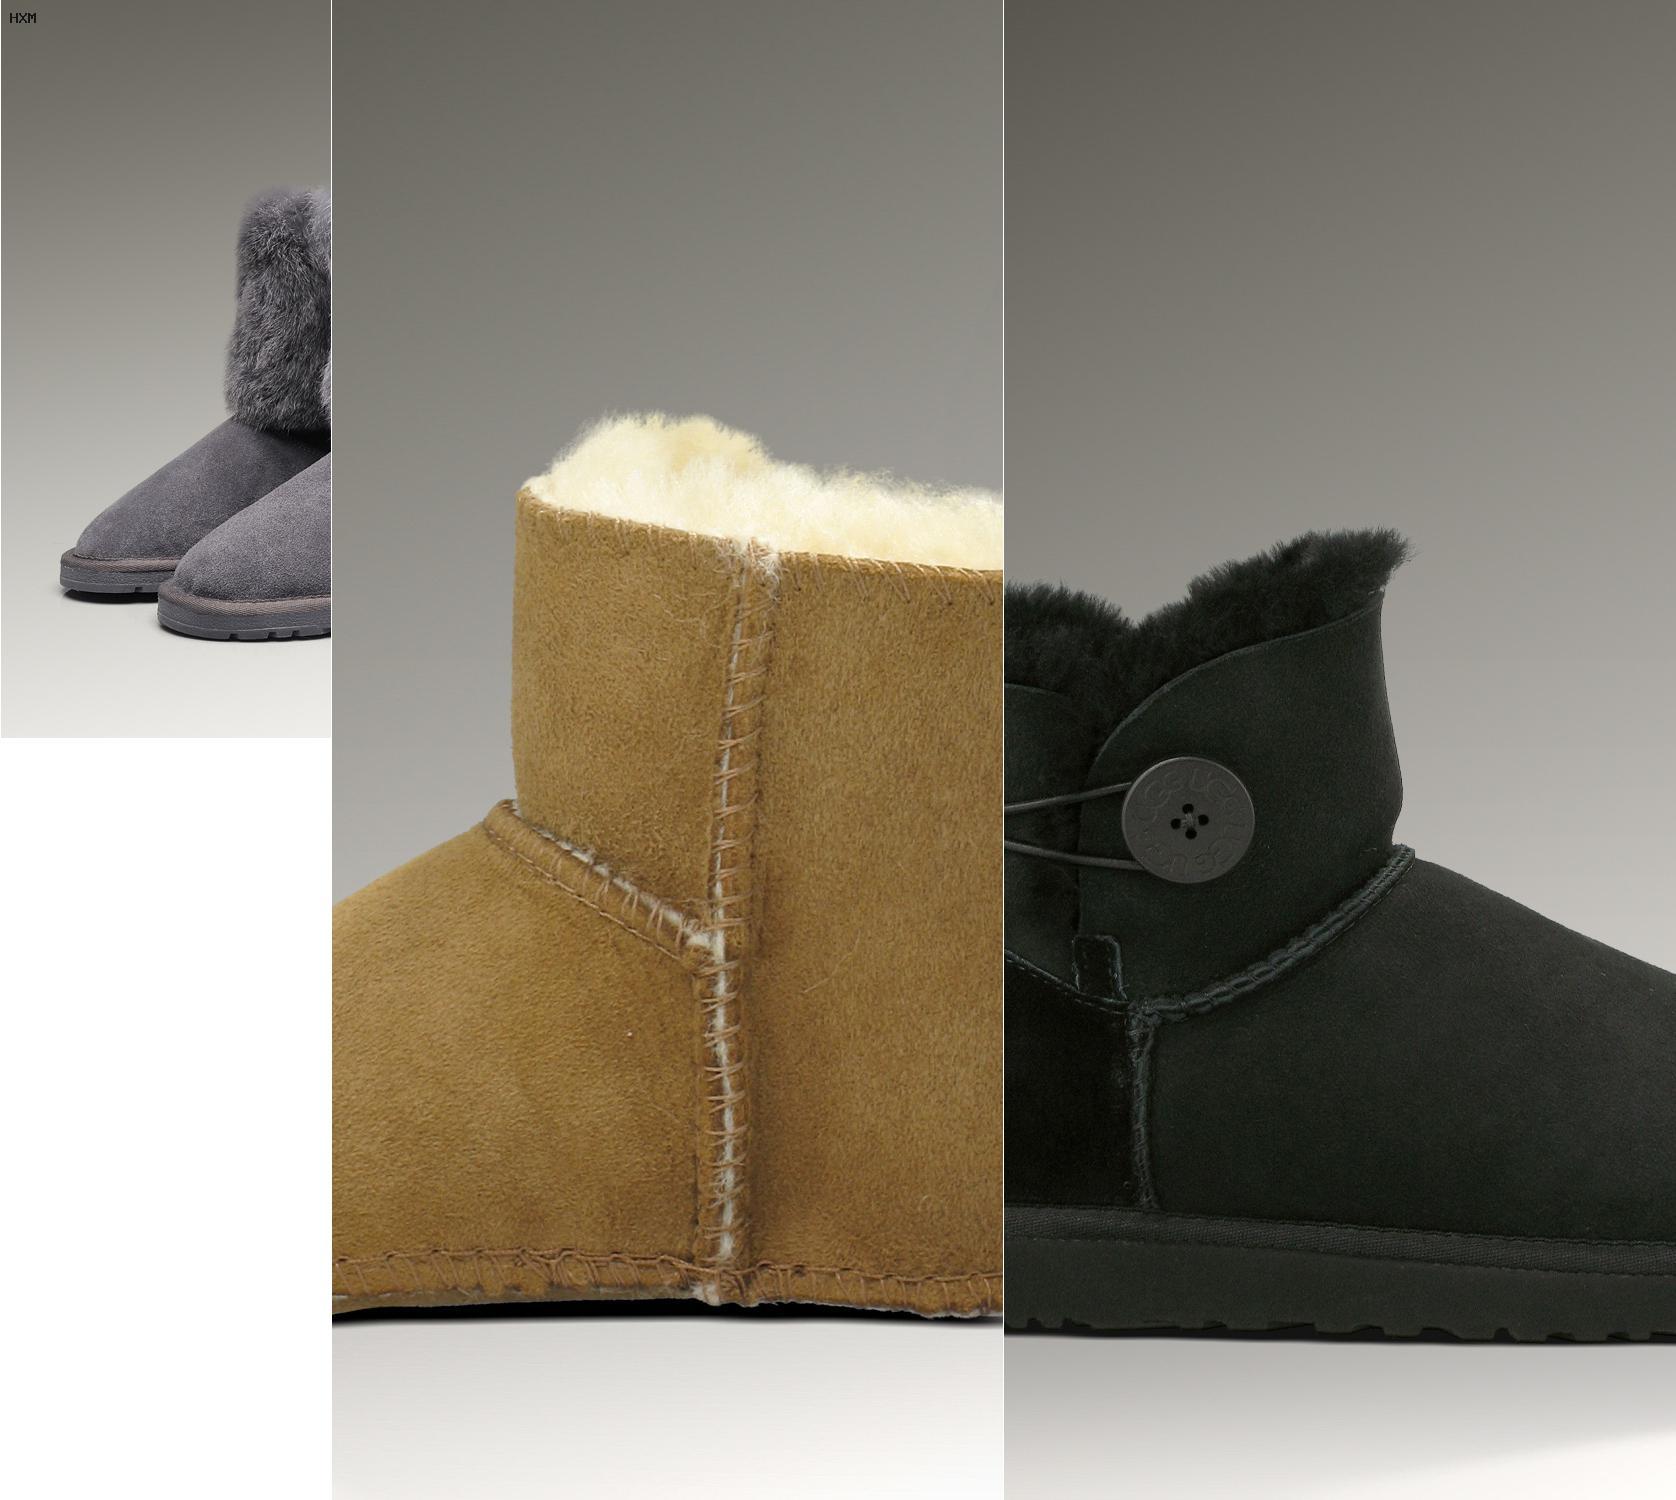 ugg stivali di lana 90c20fc3dc5